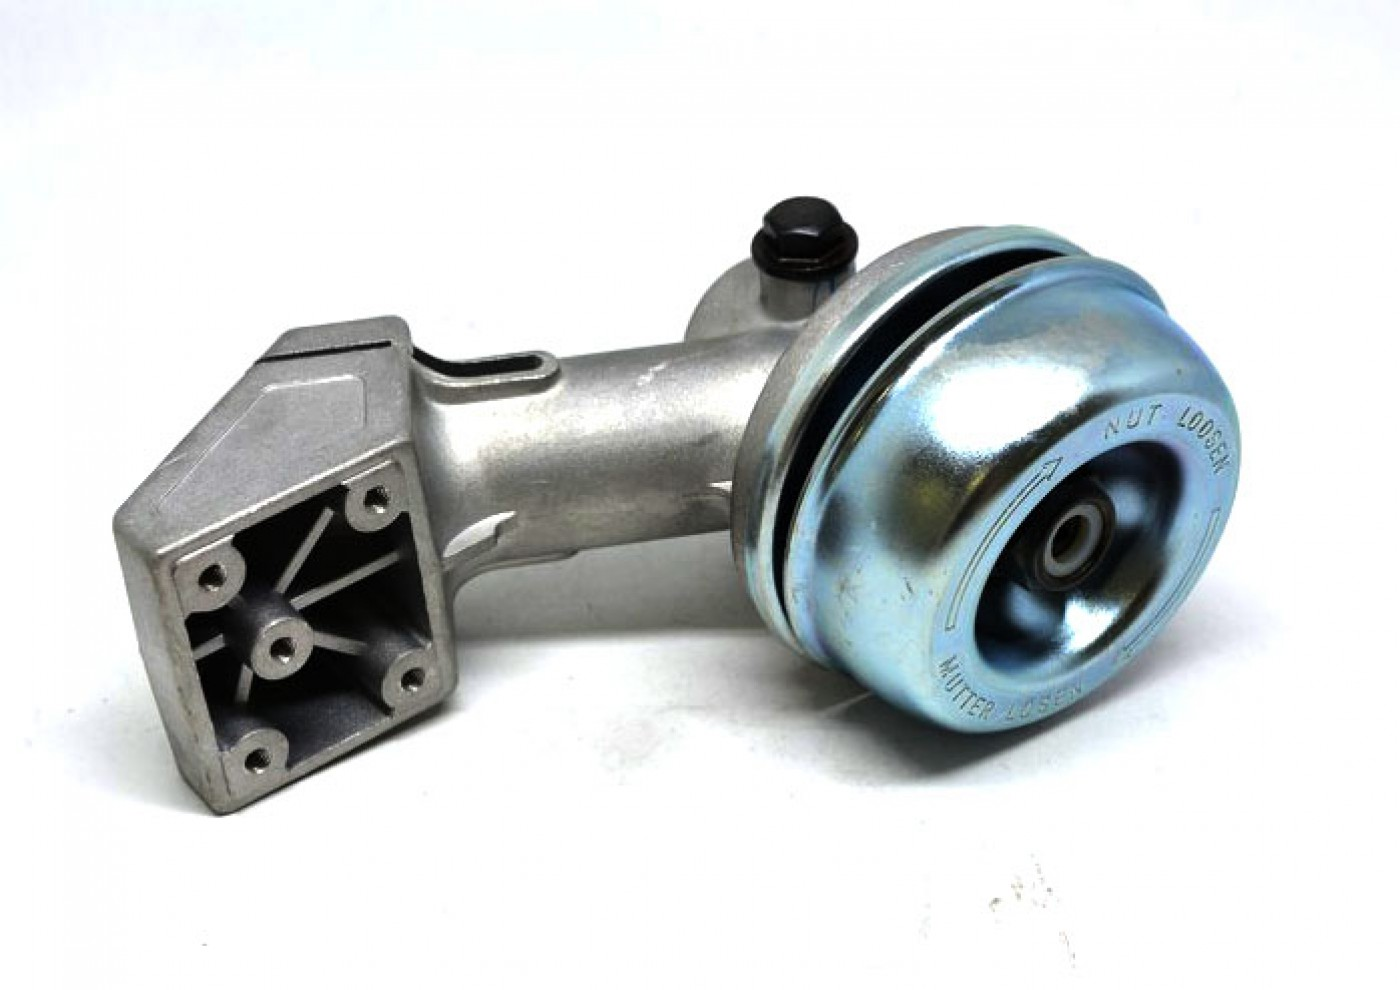 74 76 44 85 75 Stihl Getriebe Winkelgetriebe FS 36 72 40 80 83